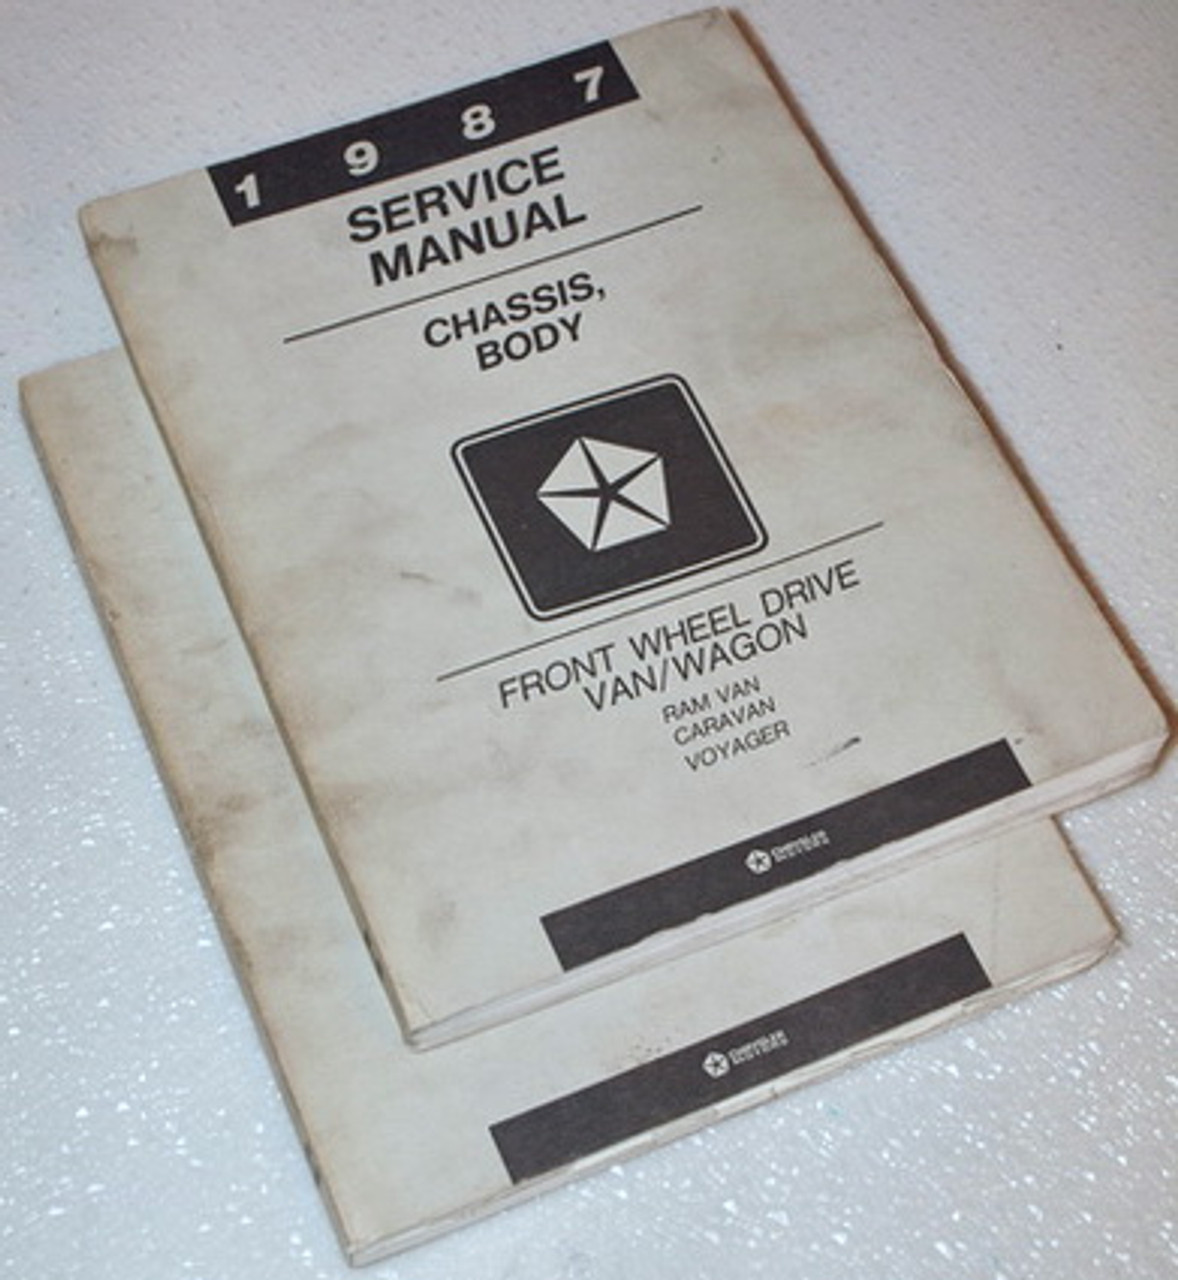 1984 Dodge Ram Van Plymouth Voyager Dodge Caravan FWD Chassis Body Manual OEM